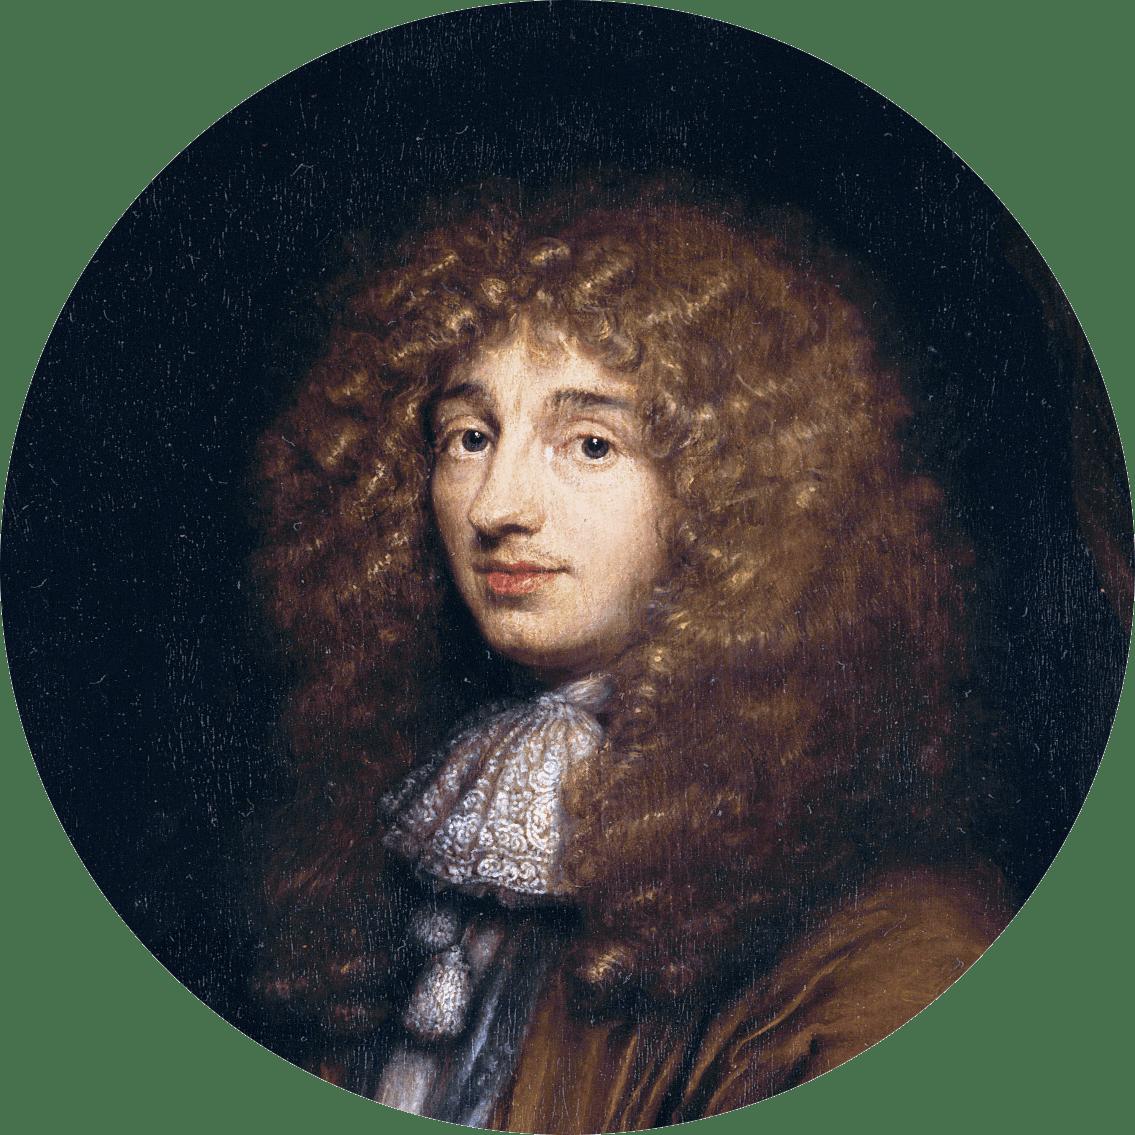 Histoire des maths - Christiaan Huygens